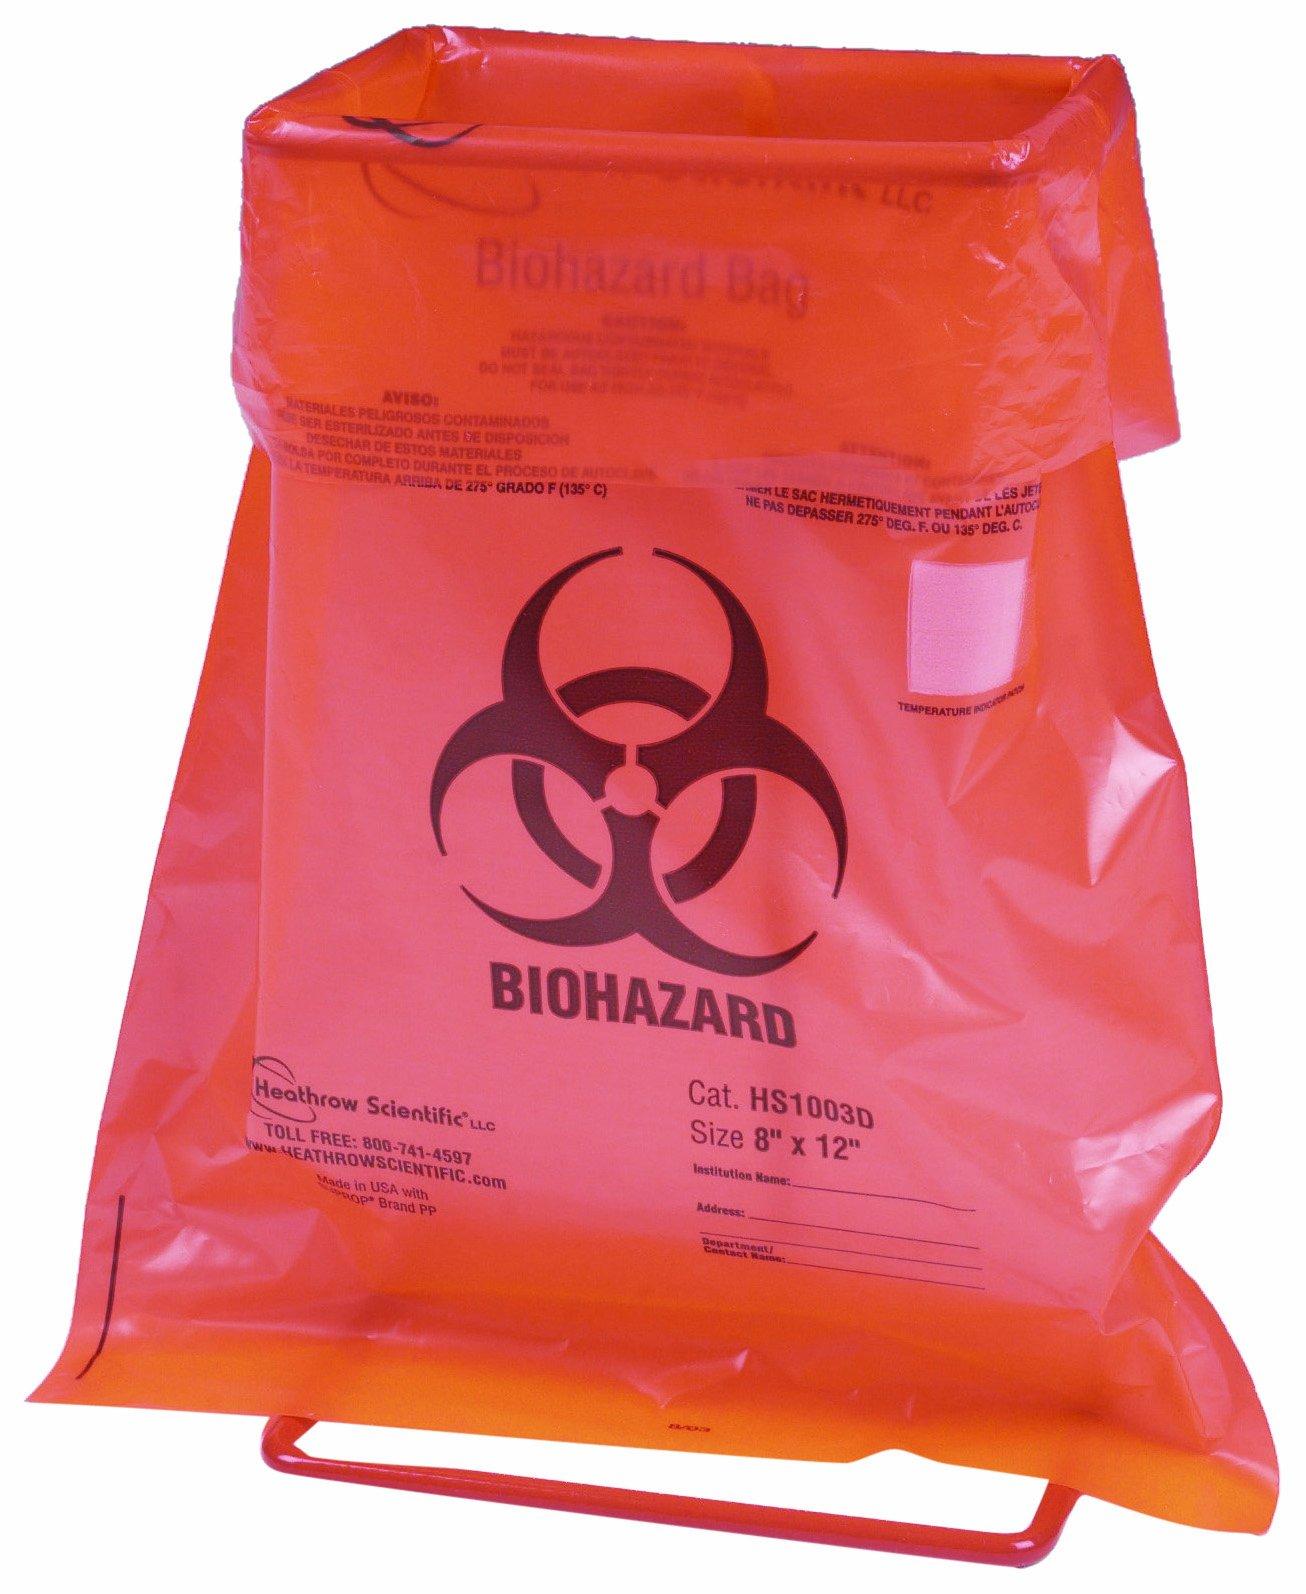 Heathrow Scientific HS10044H Biohazard Bag Holder, Steel Wire, Epoxy Coated, 3.58'' x 5.03'' x .82'' in (9.1 x 12.8 x 2.1 cm), Red, 1/ea